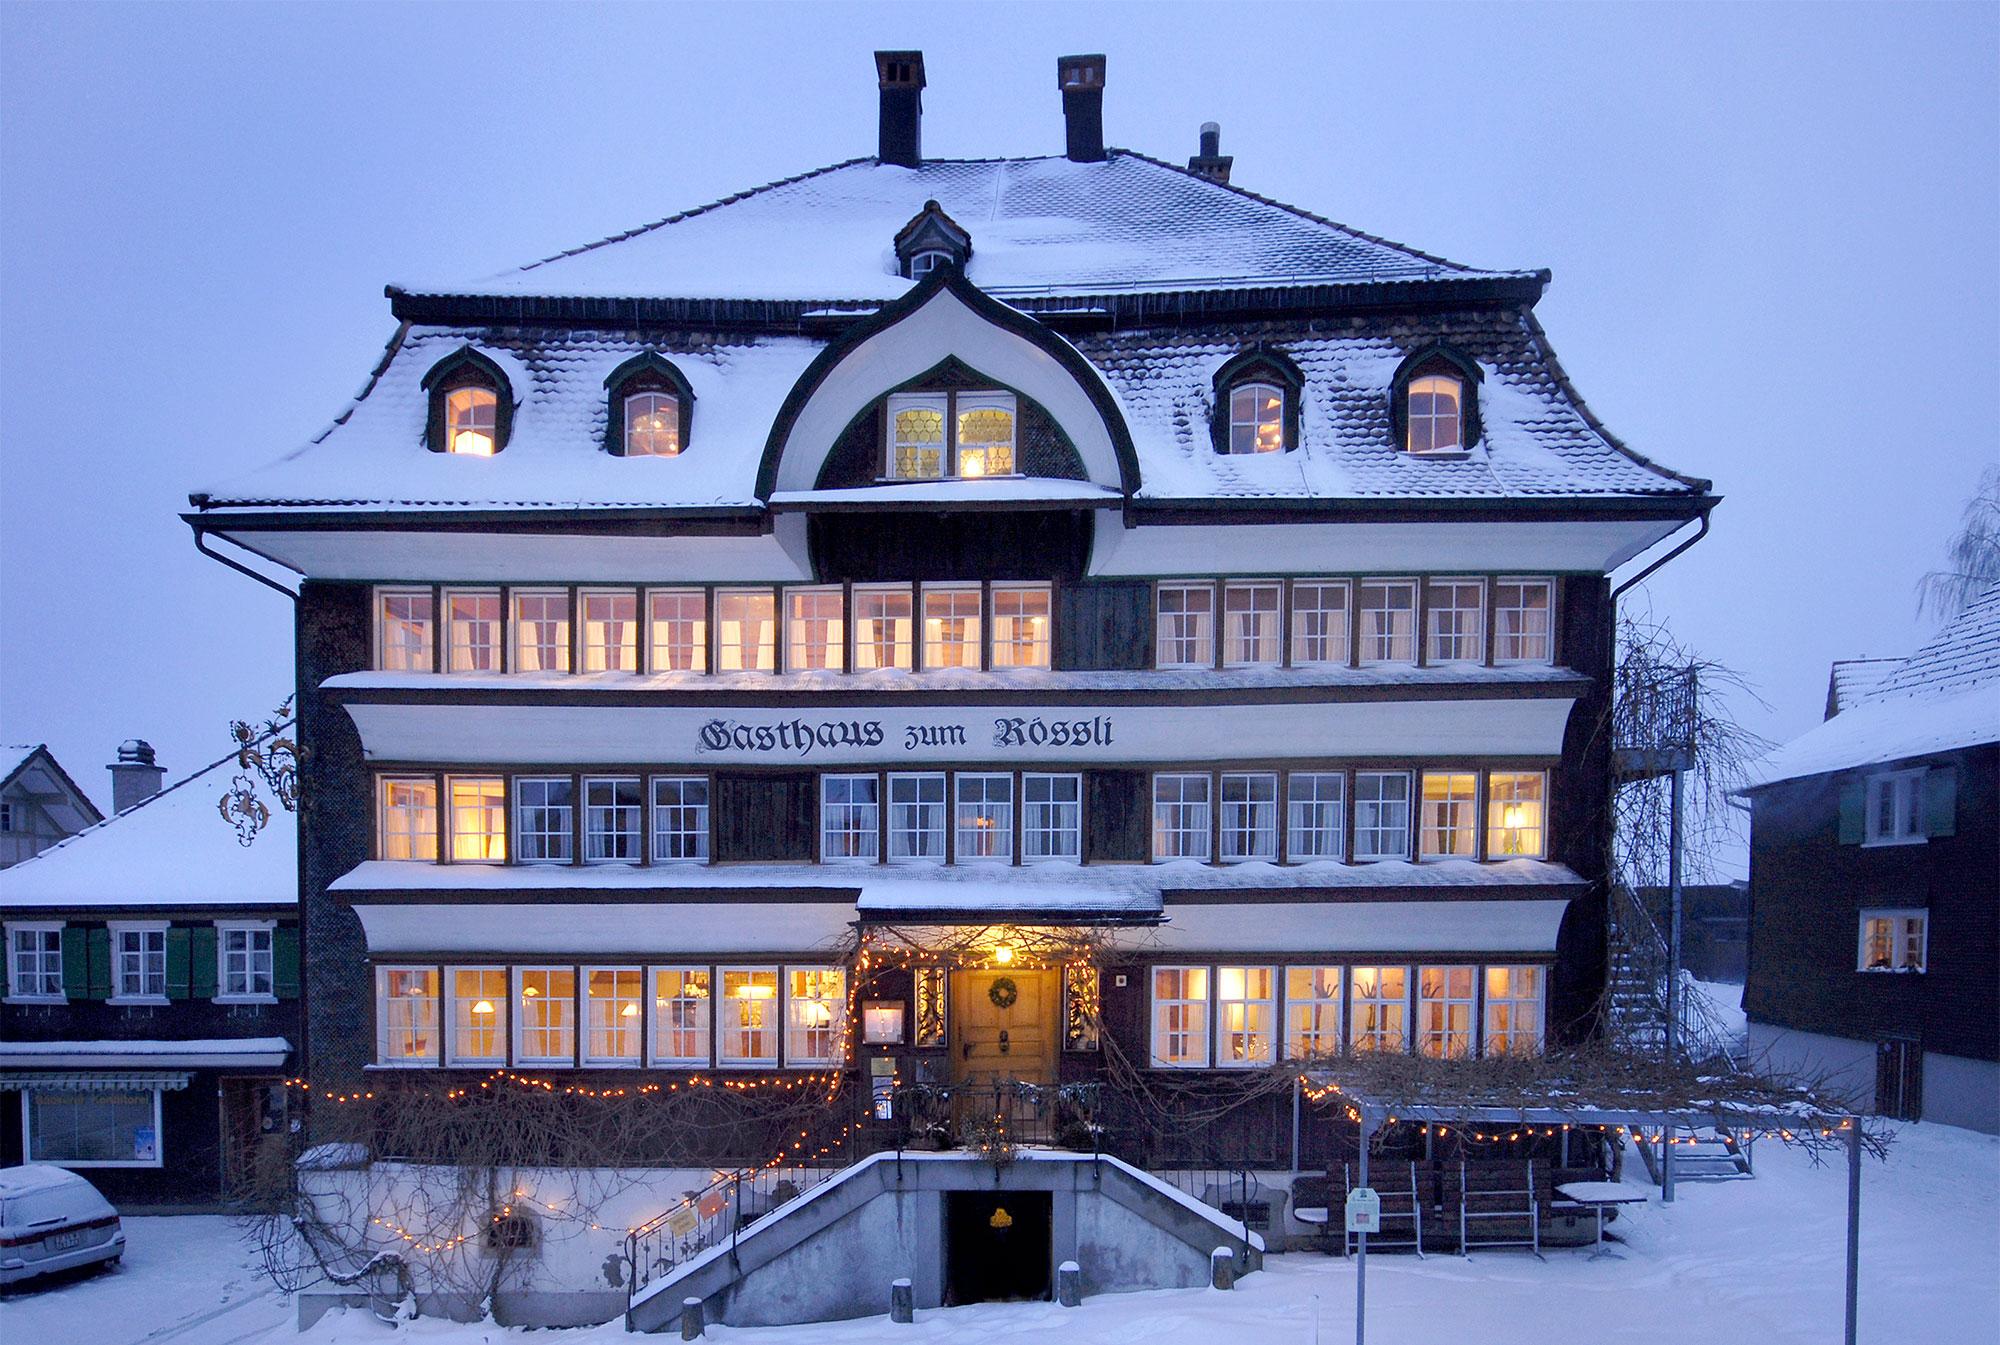 Winter exterior view of the Rössli Mogelsberg